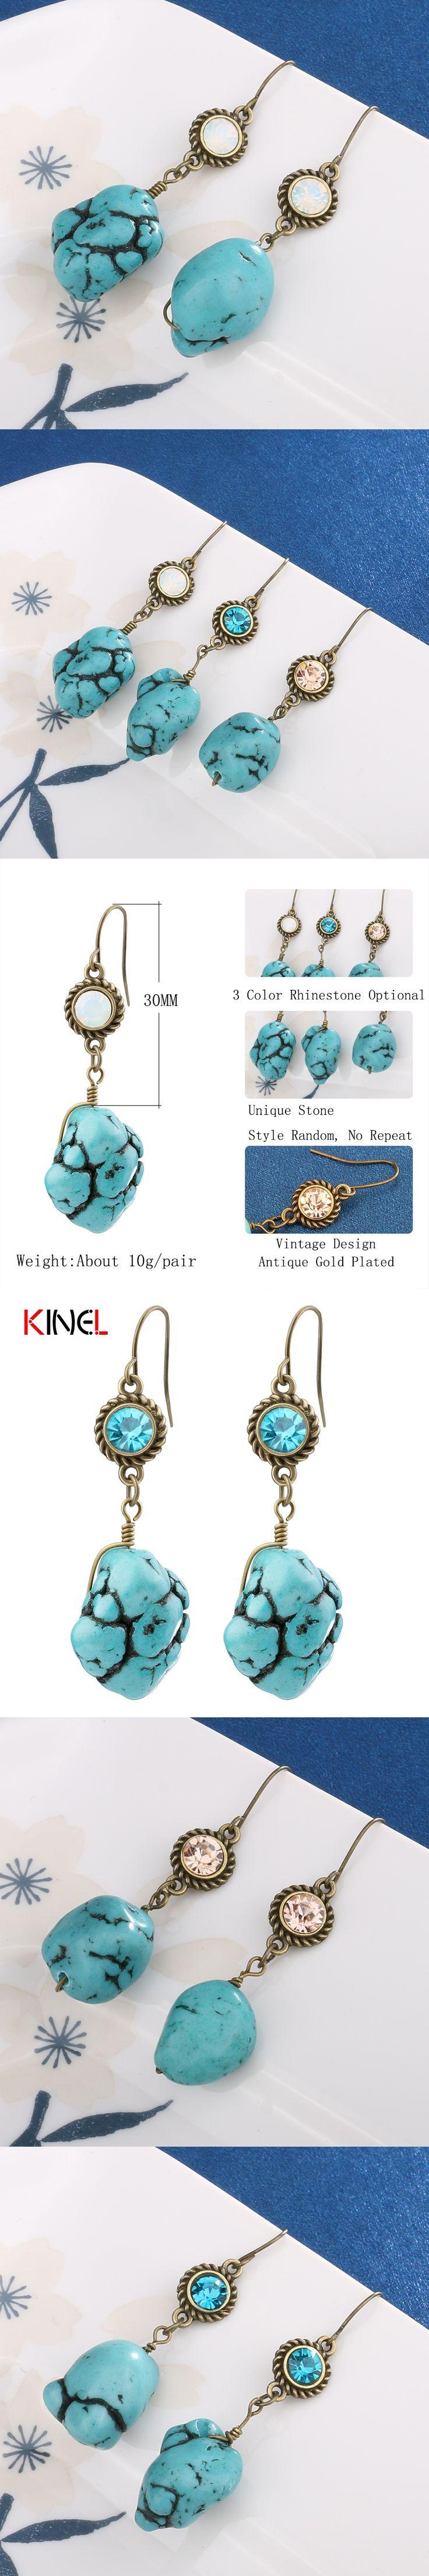 2017 NEW Kinel Fashion BOHO Hang Artificial Stone Drop Earrings For Women Unique Vintage Jewelry Random Stone Earring